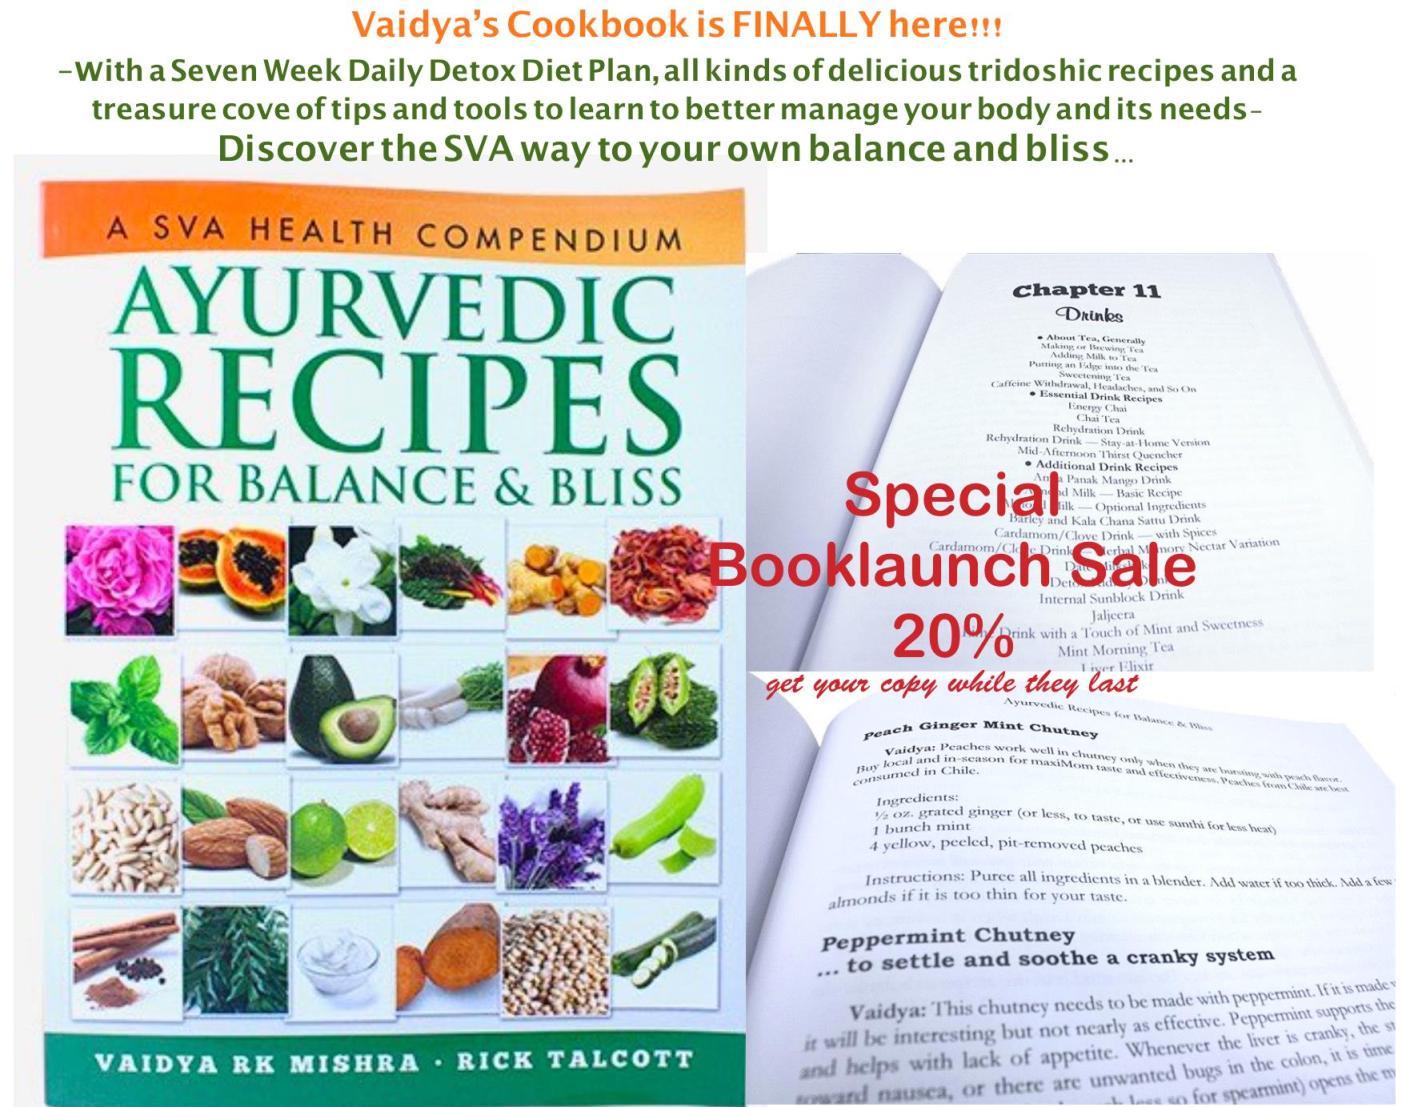 Ayurvedic Recipes For Balance & Bliss - Cooking Book • Shaka Vansiya